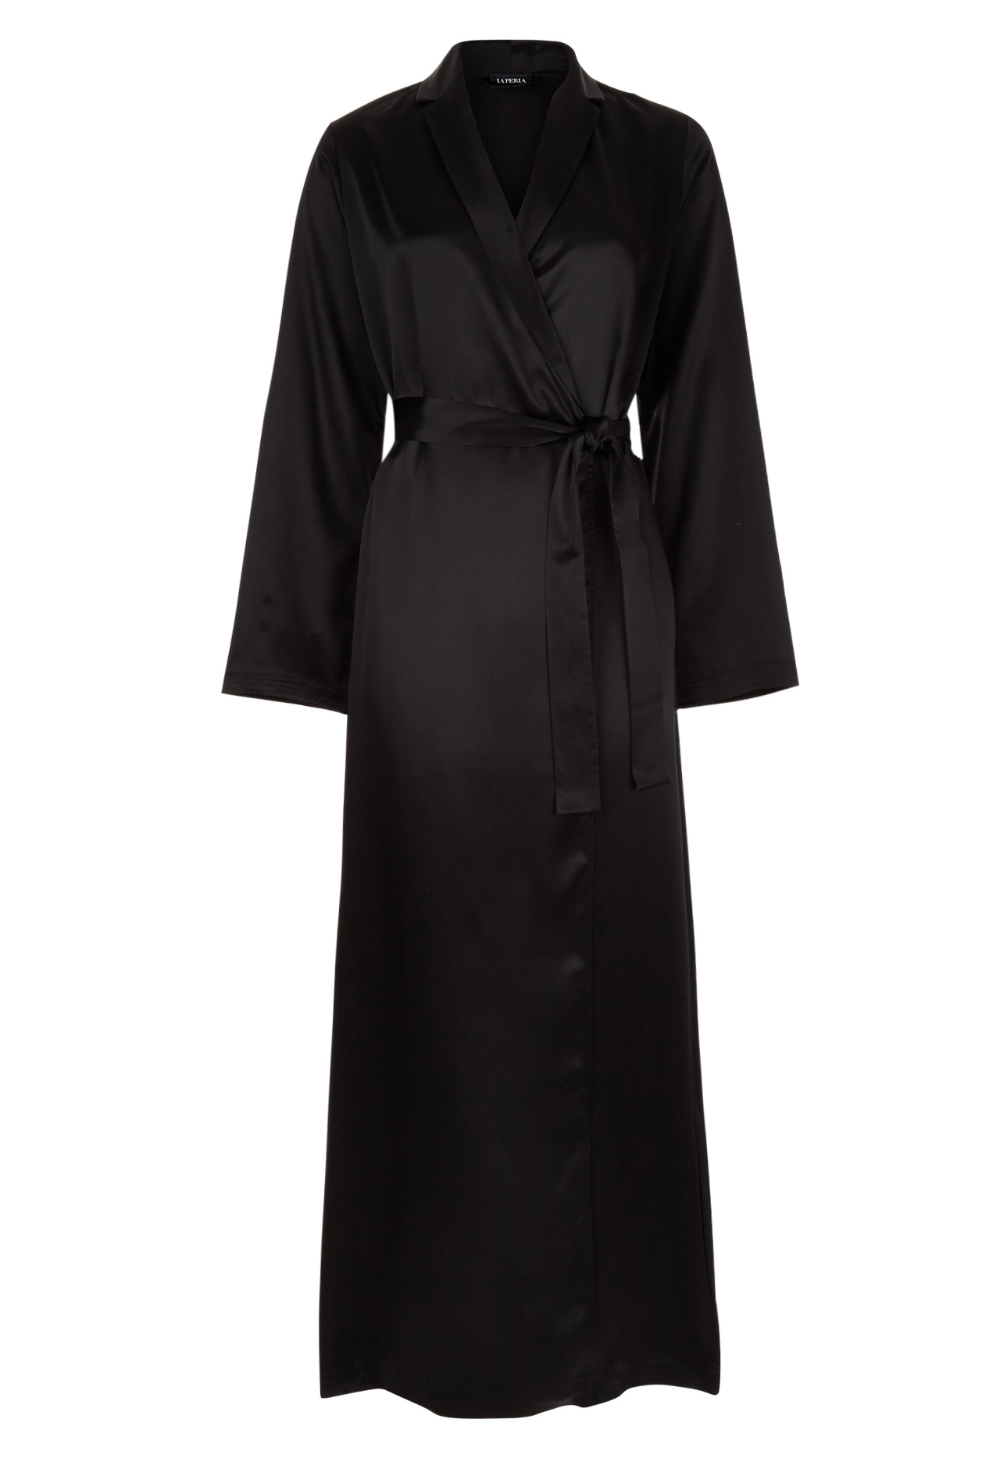 Black Silk Long Robe In 2020 Black Silk Robe Long Robe Black Silk